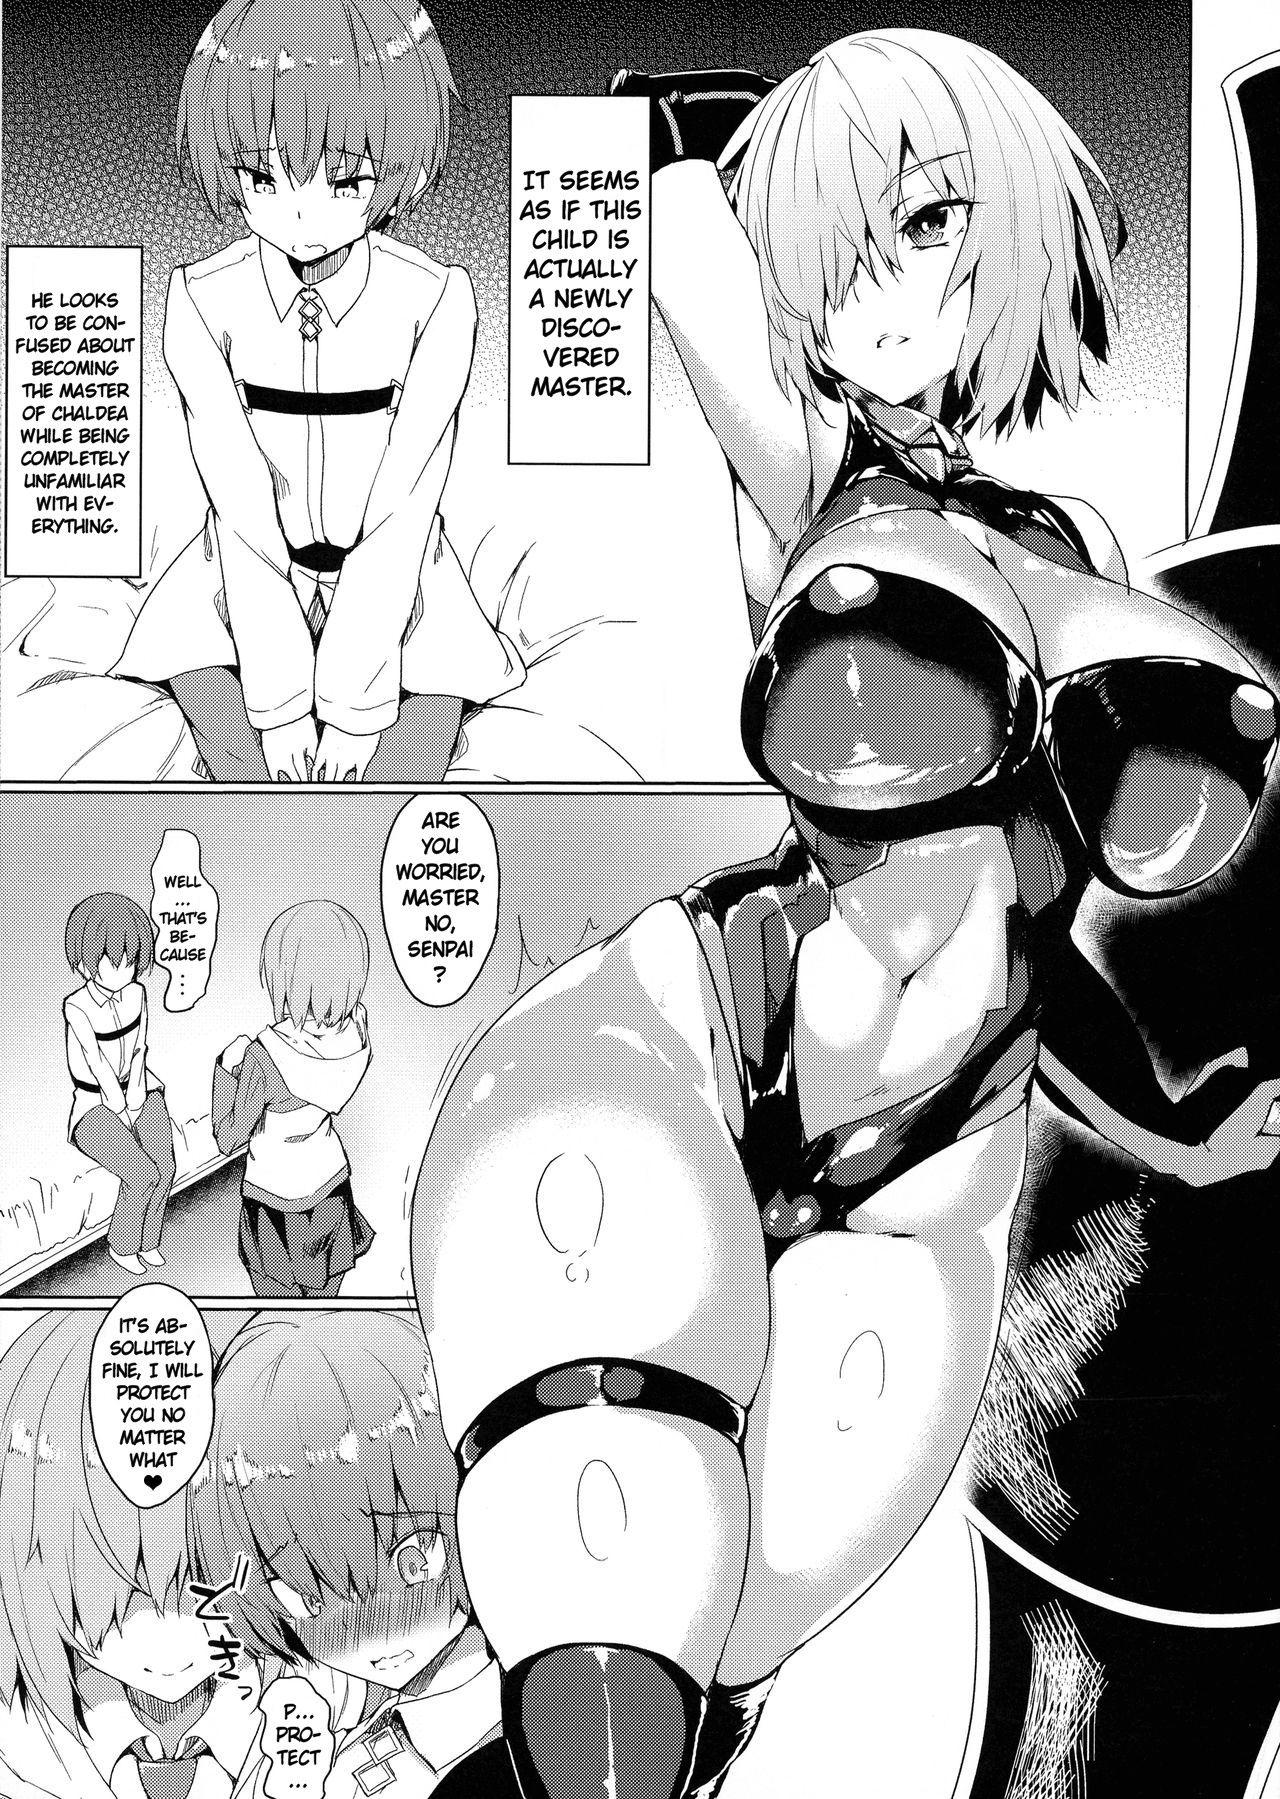 Mash Onee-chan to Shota Master 4